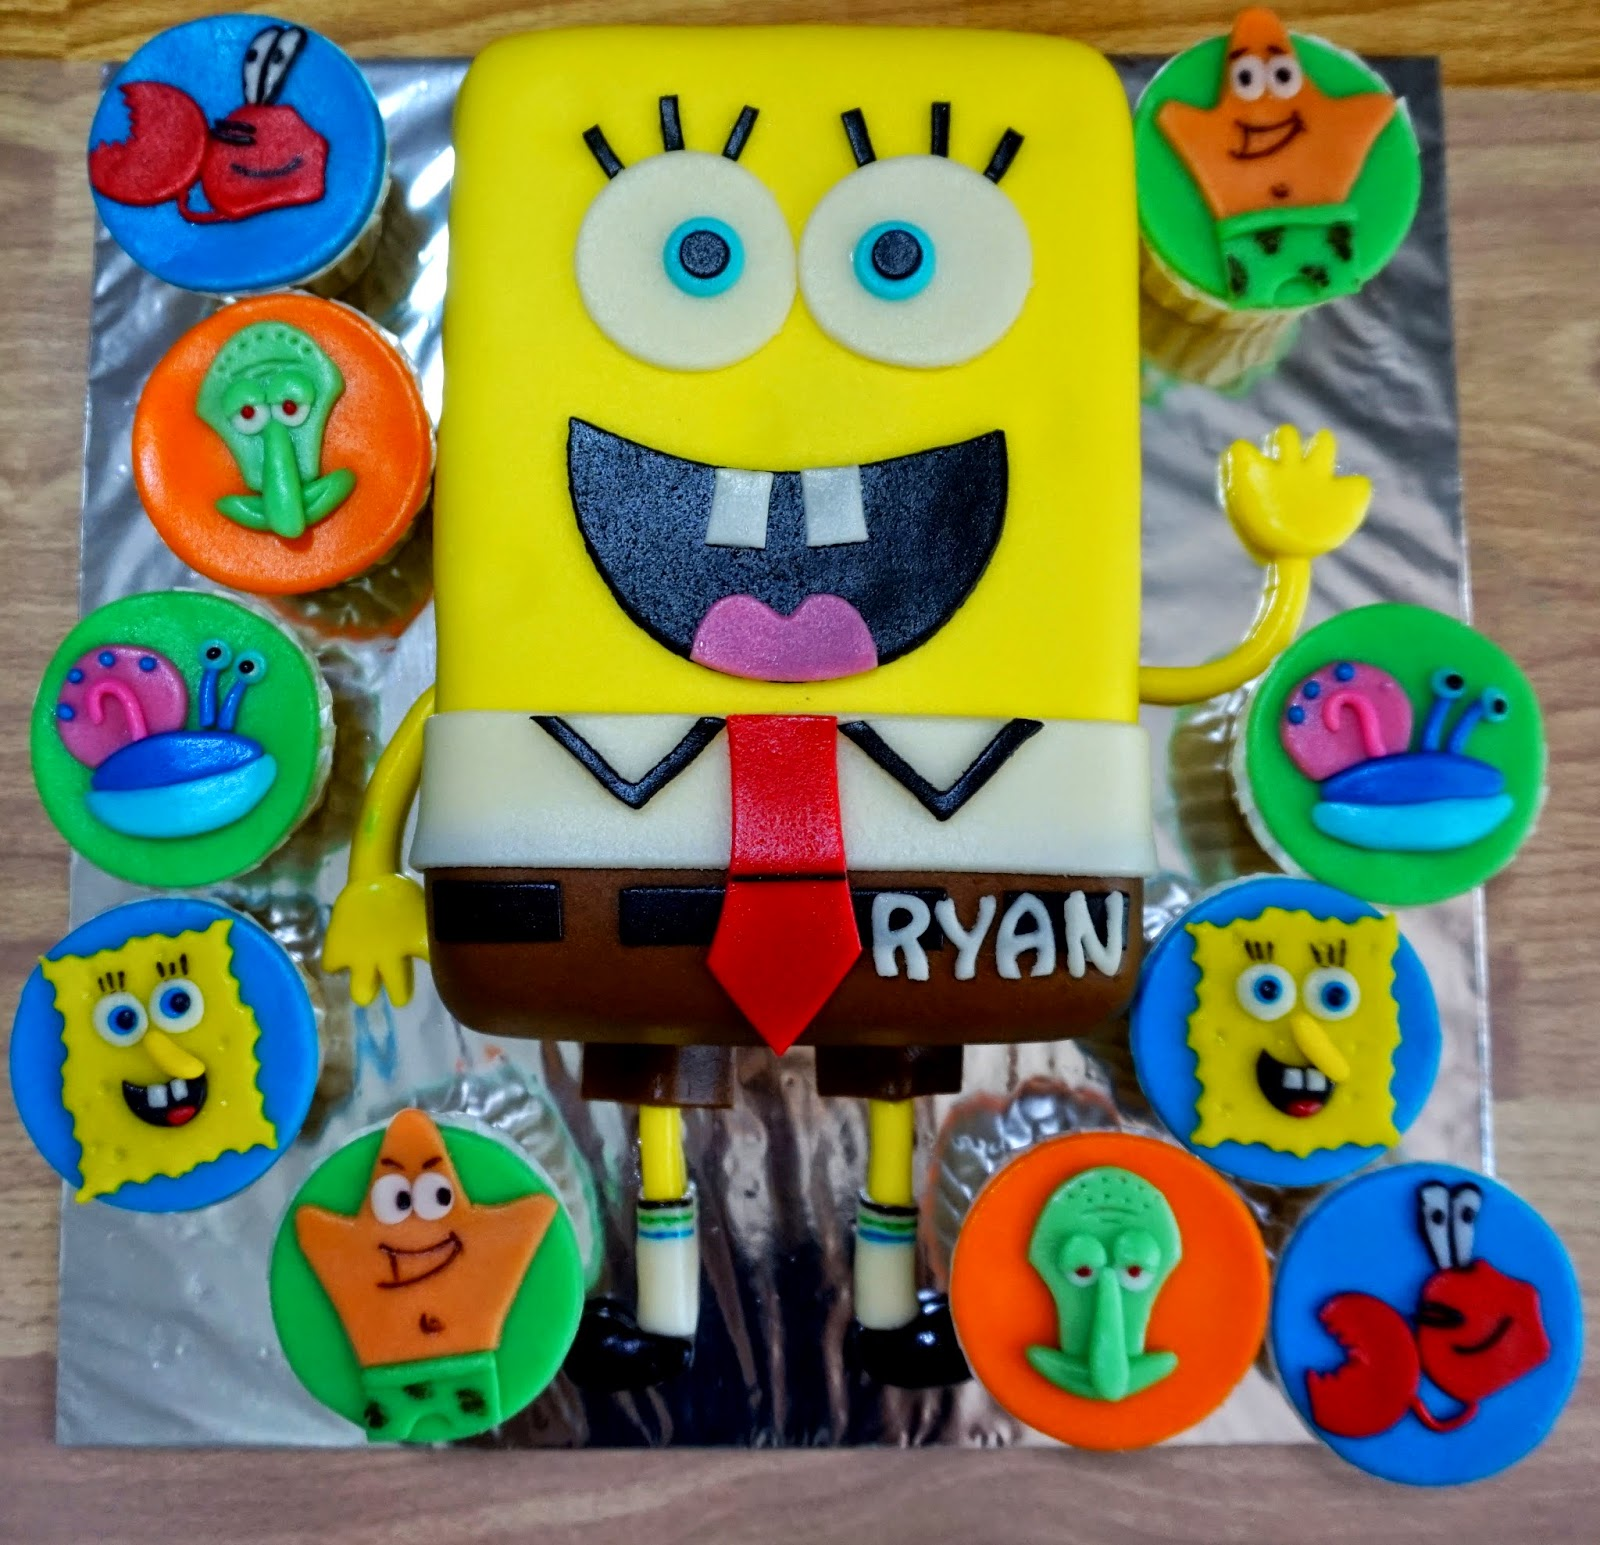 Sherbakes Spongebob Cake and cupcakes